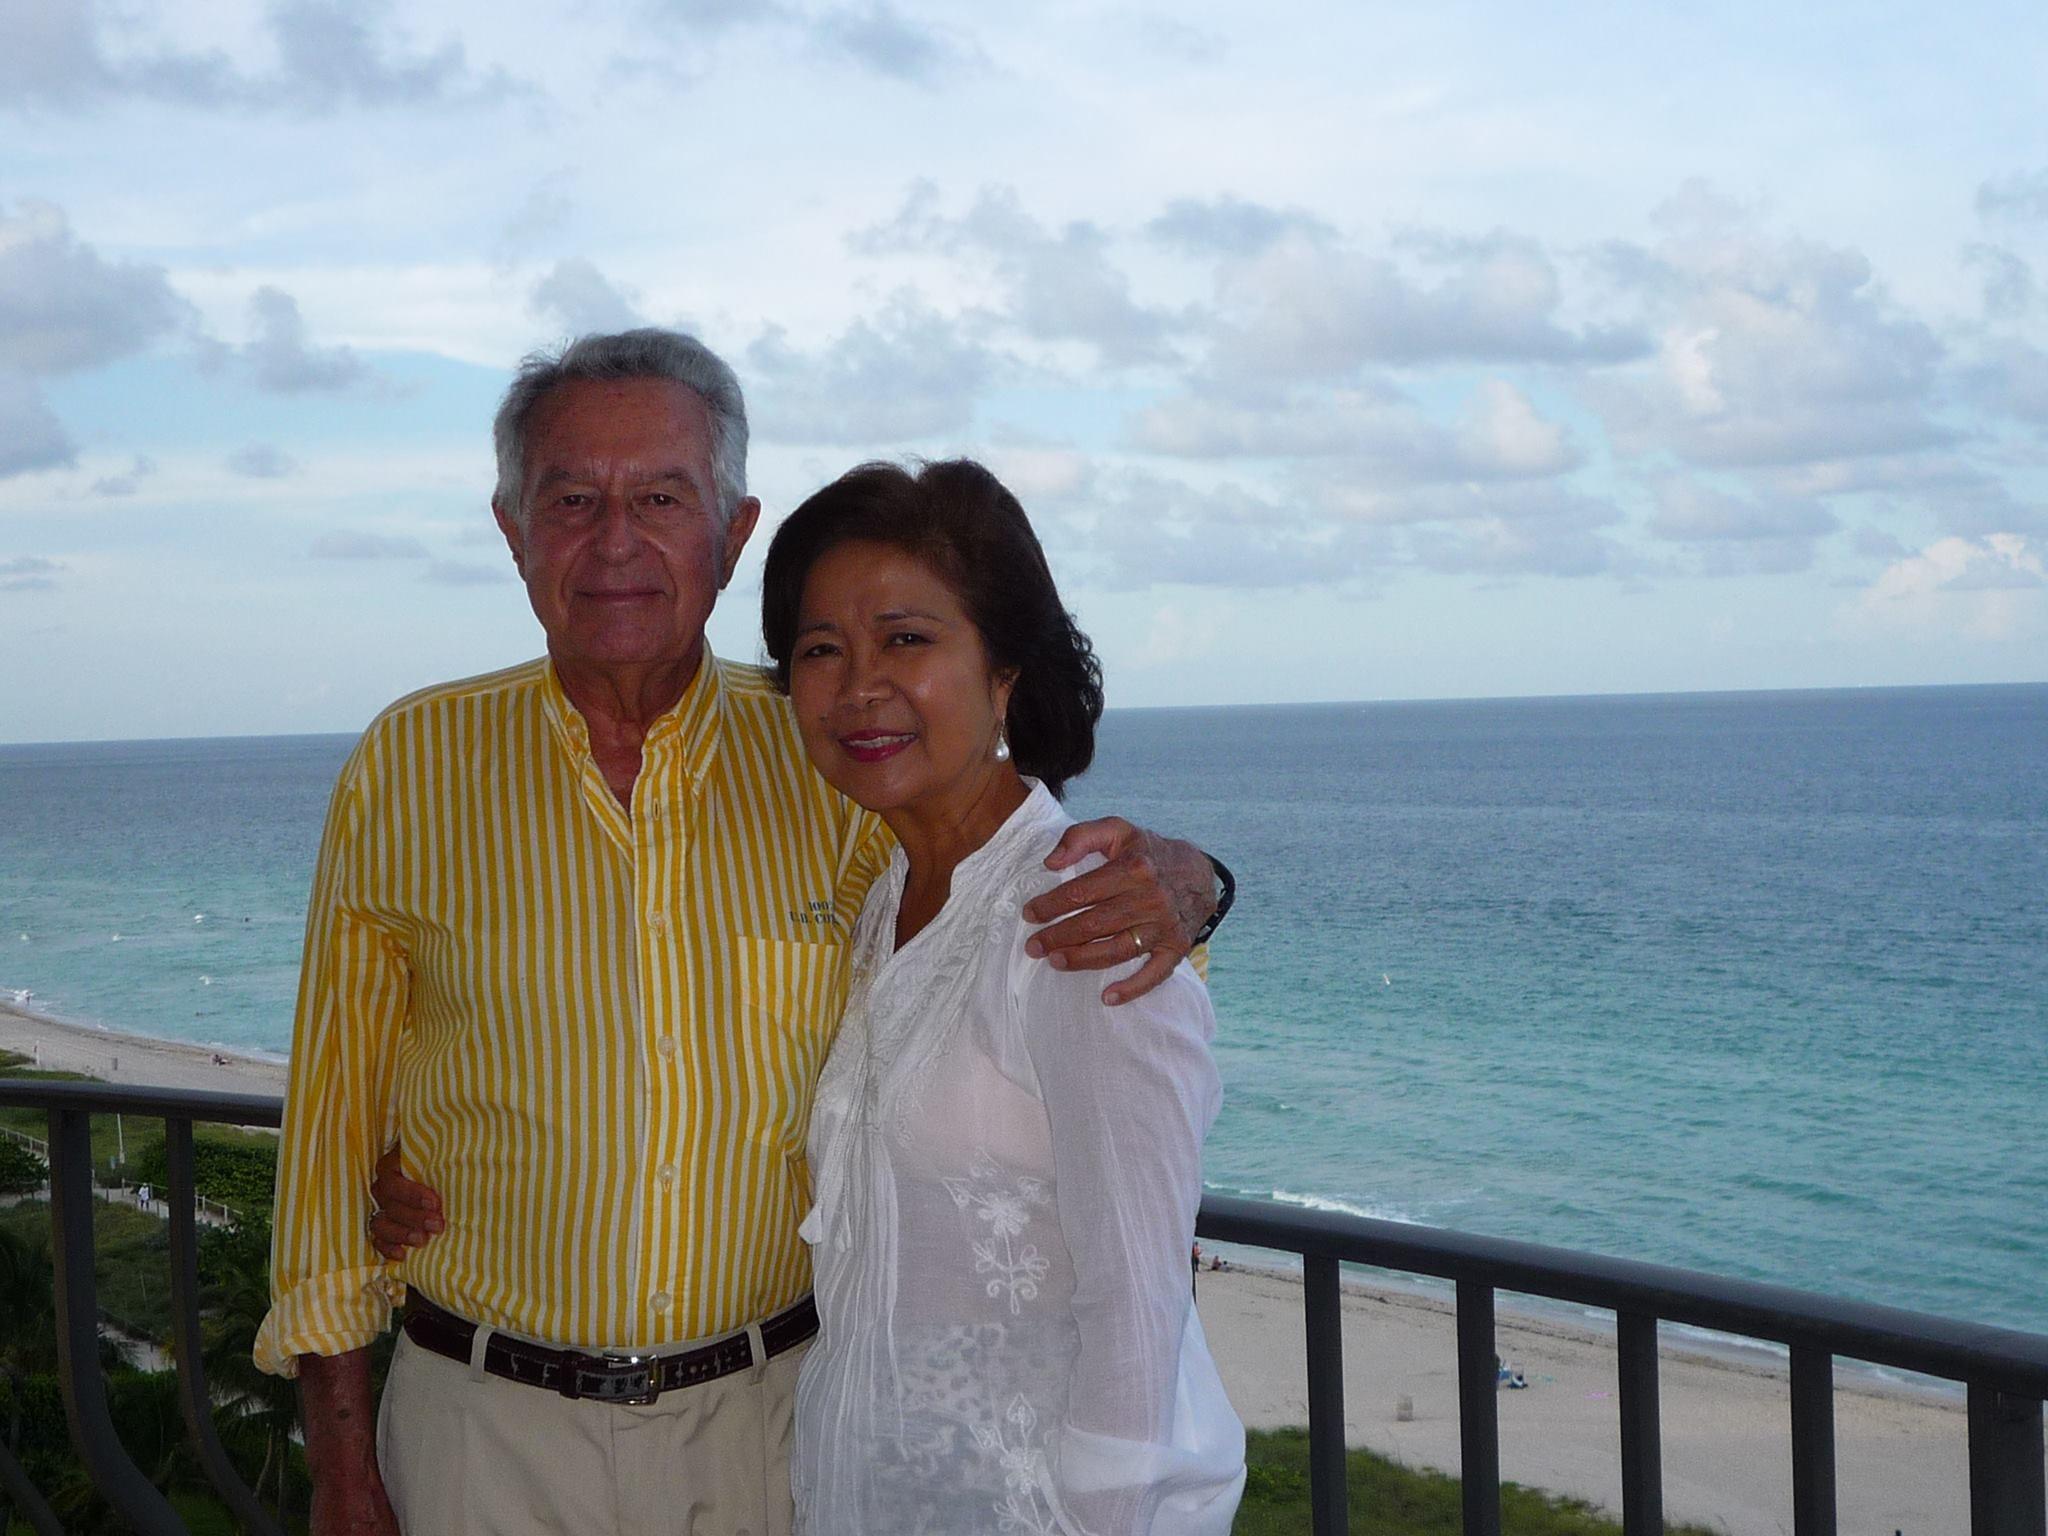 Claudio Bonnefoy and Maricoy Obias Bonnefoy on the balcony of their oceanfront condo.